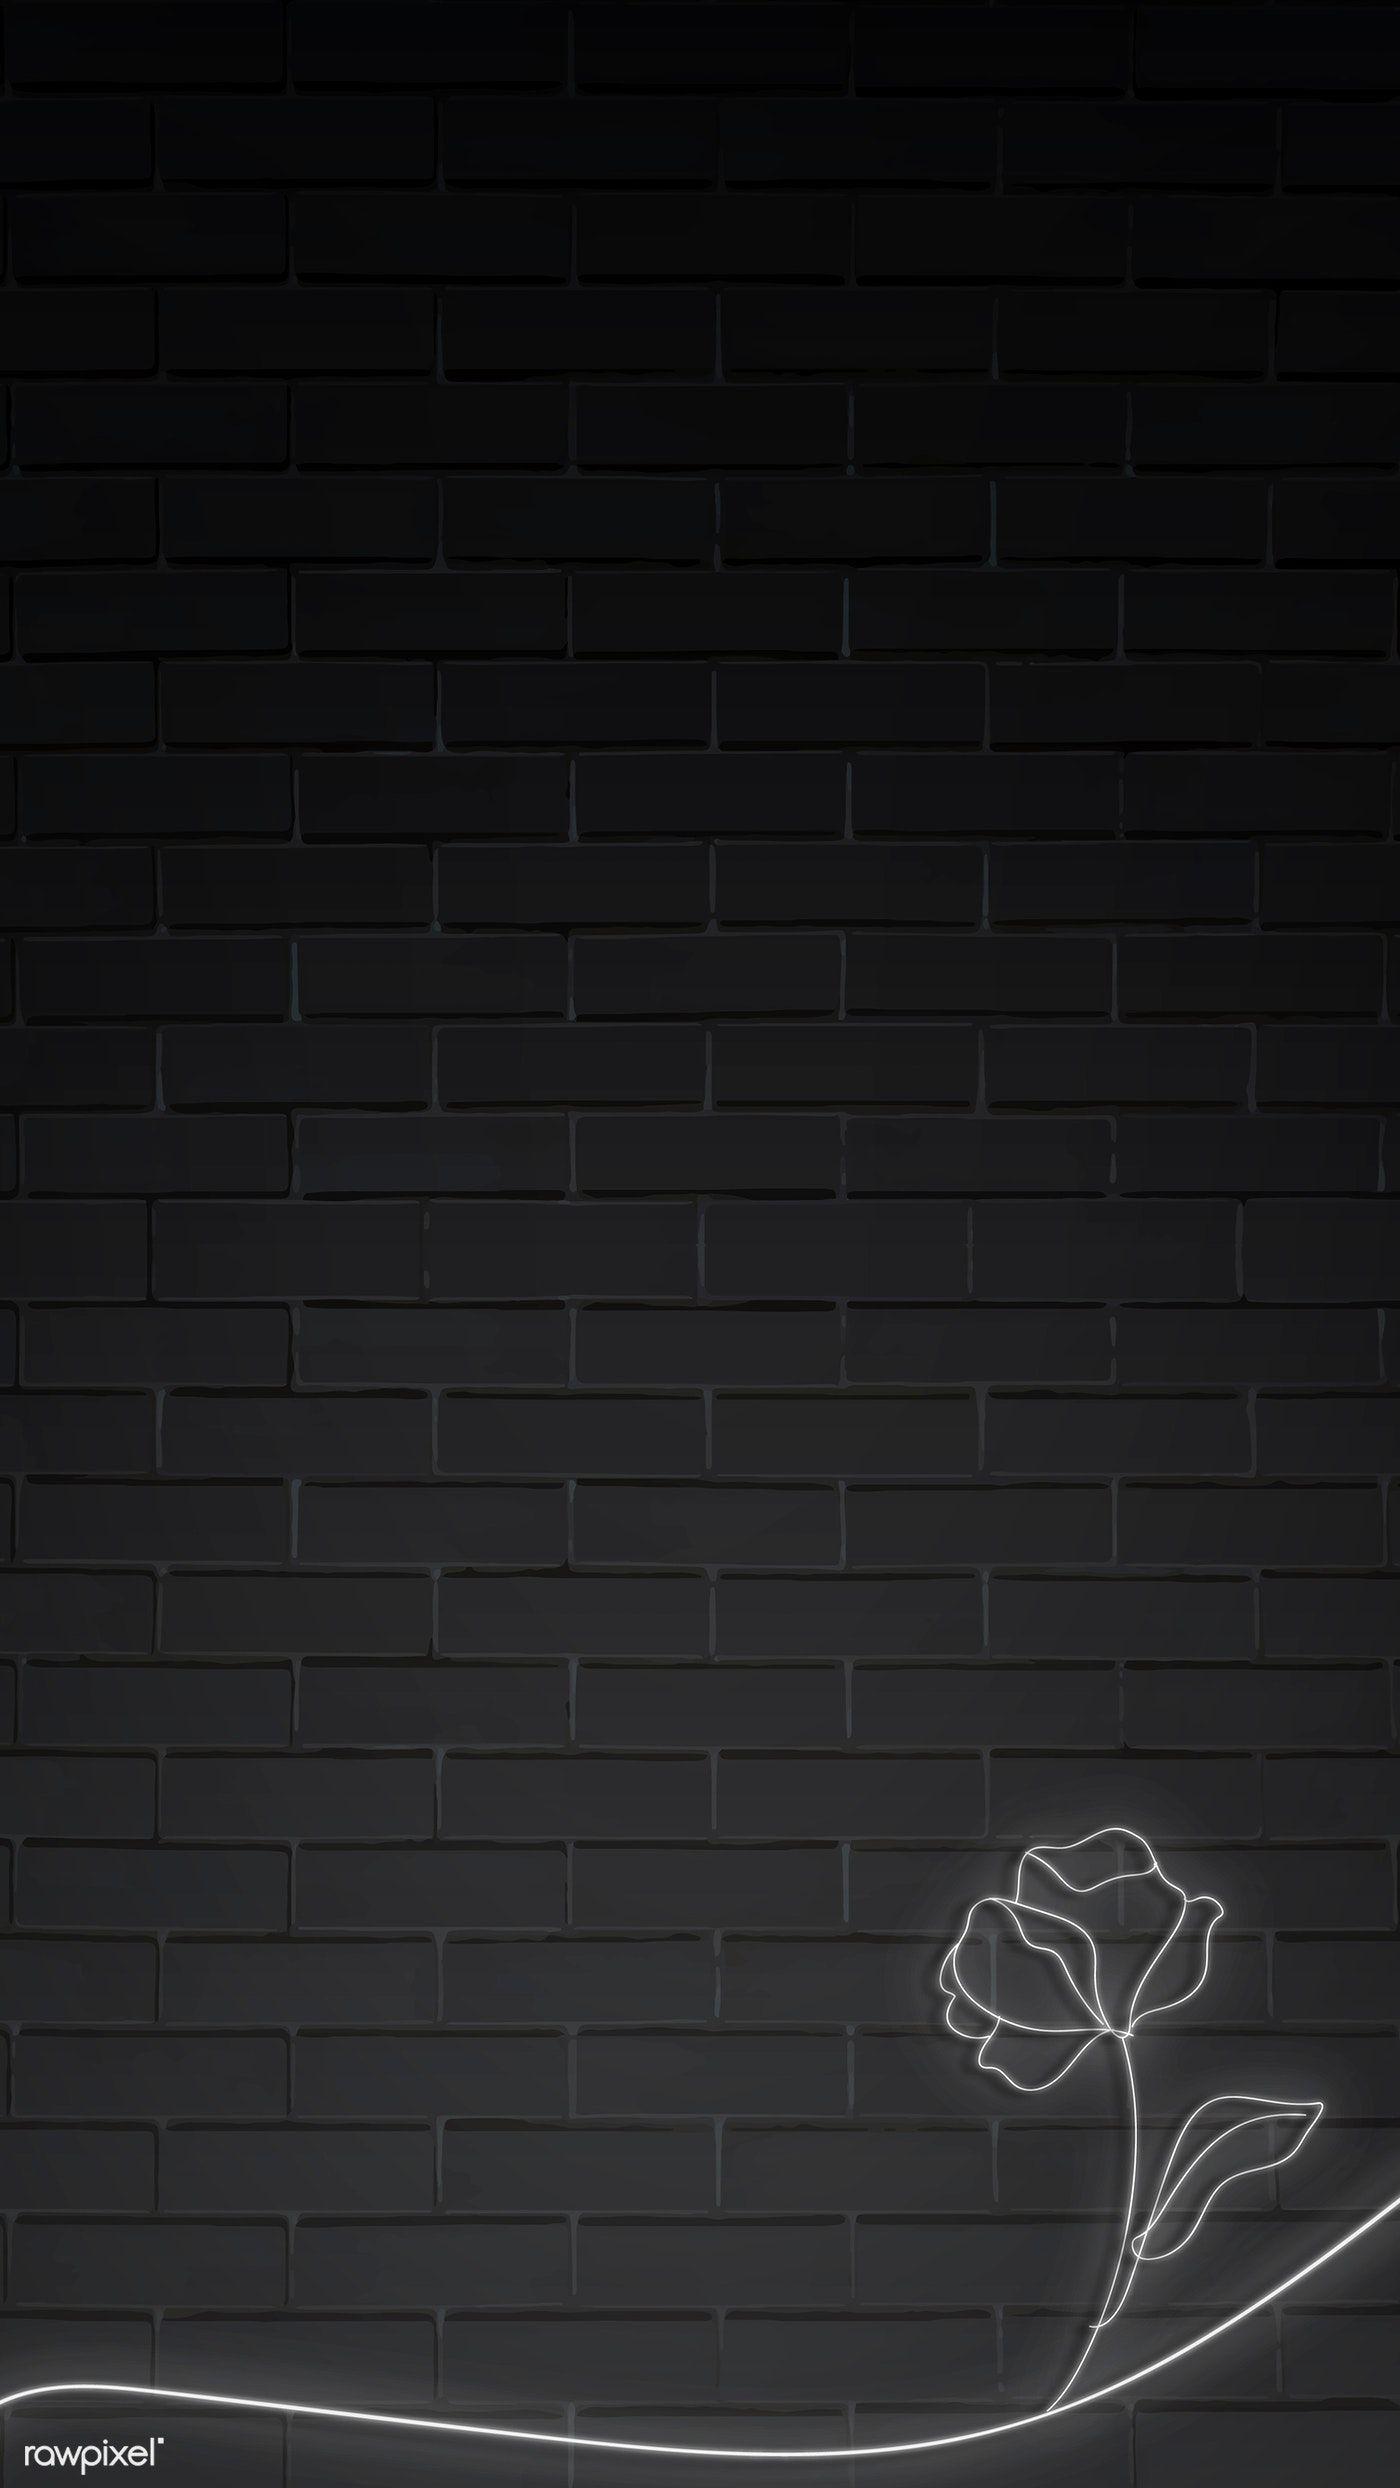 Download Premium Vector Of Neon Lights Flower On Black Brick Wall Mobile Black Brick Wall Neon Wallpaper Black Background Wallpaper